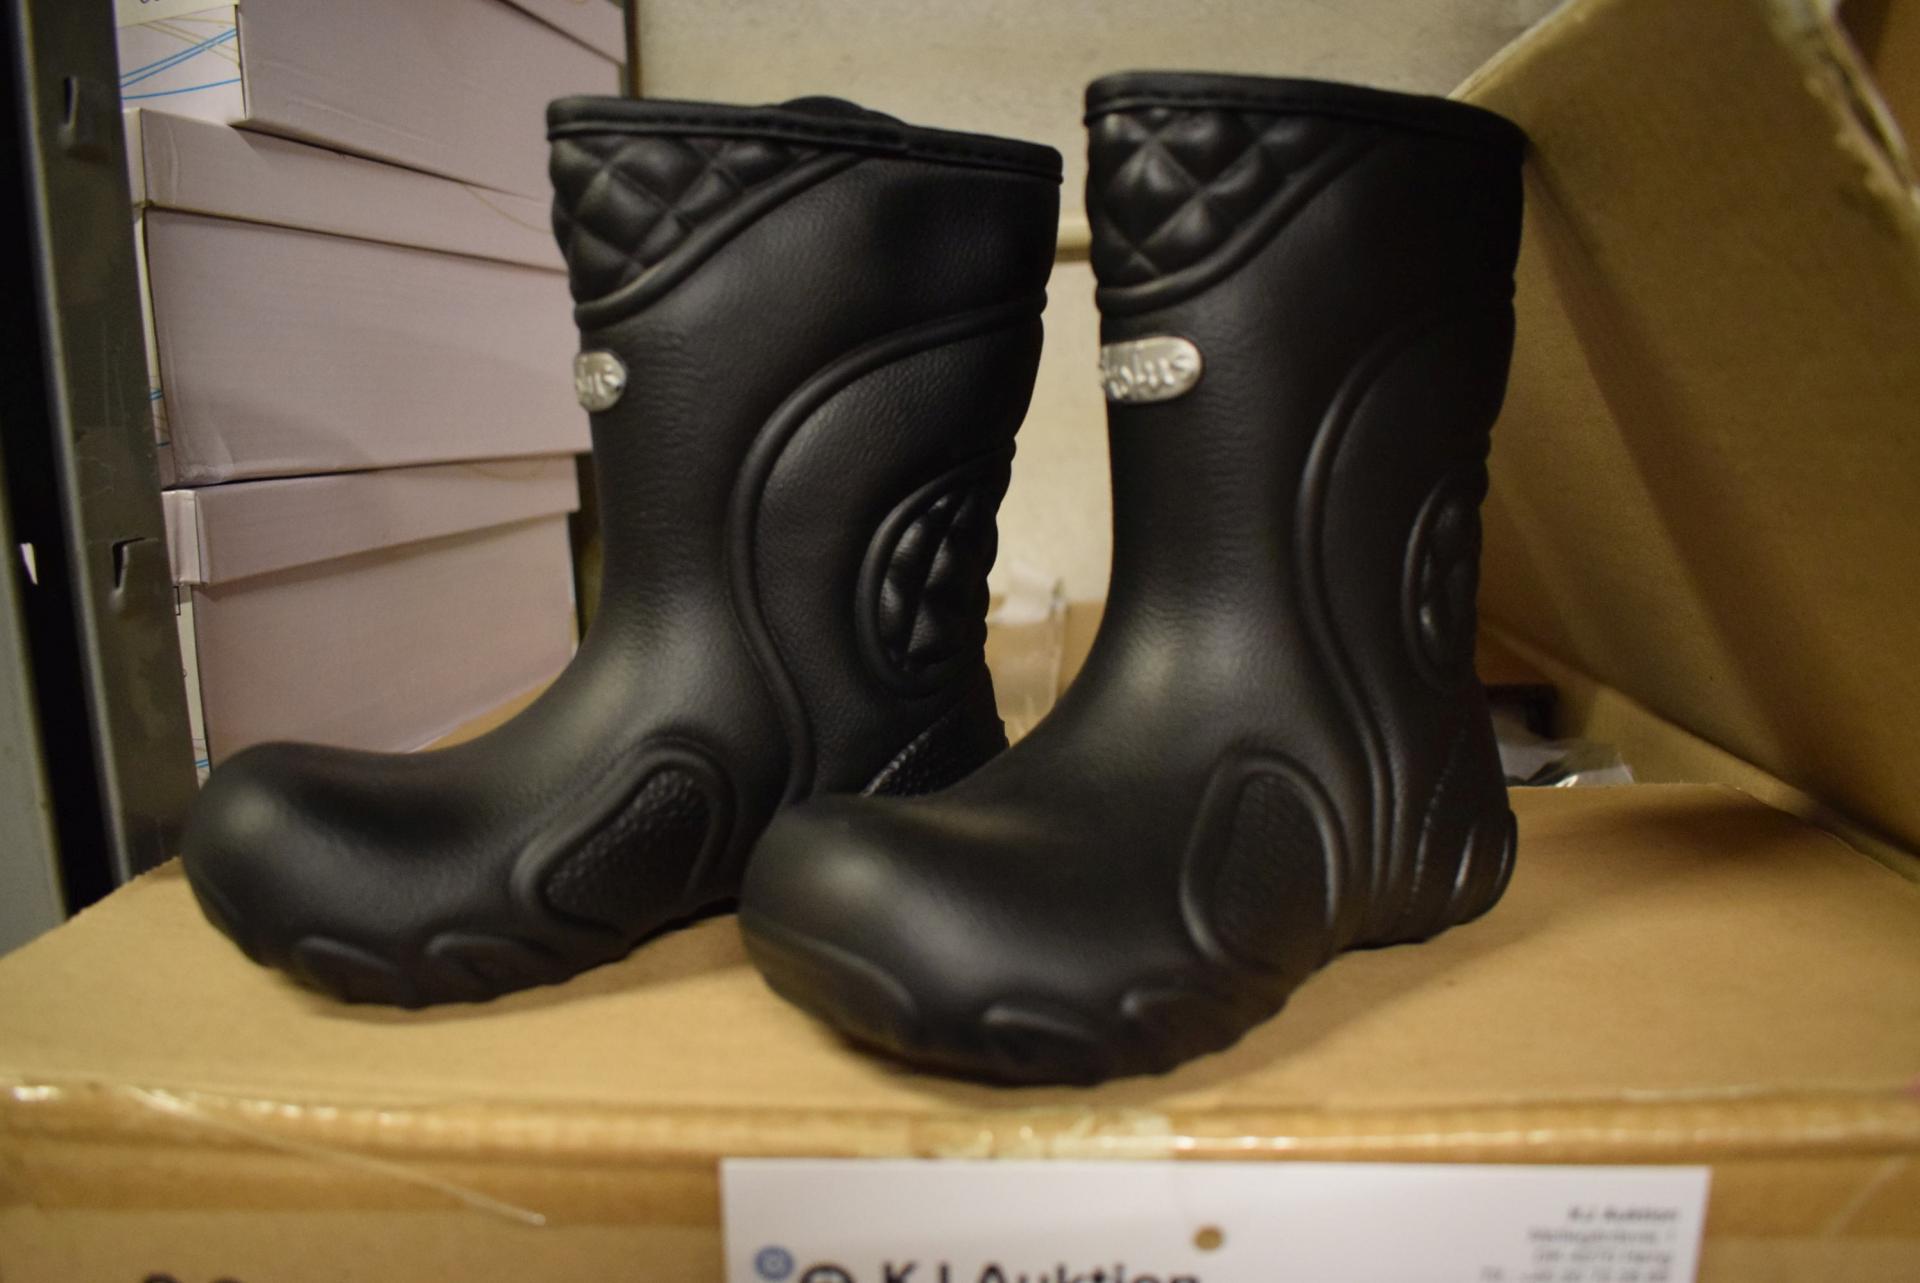 0a283d905151 12 pairs SKOFUS children rubber boots Str. 22 - KJ Auktion - Machine ...